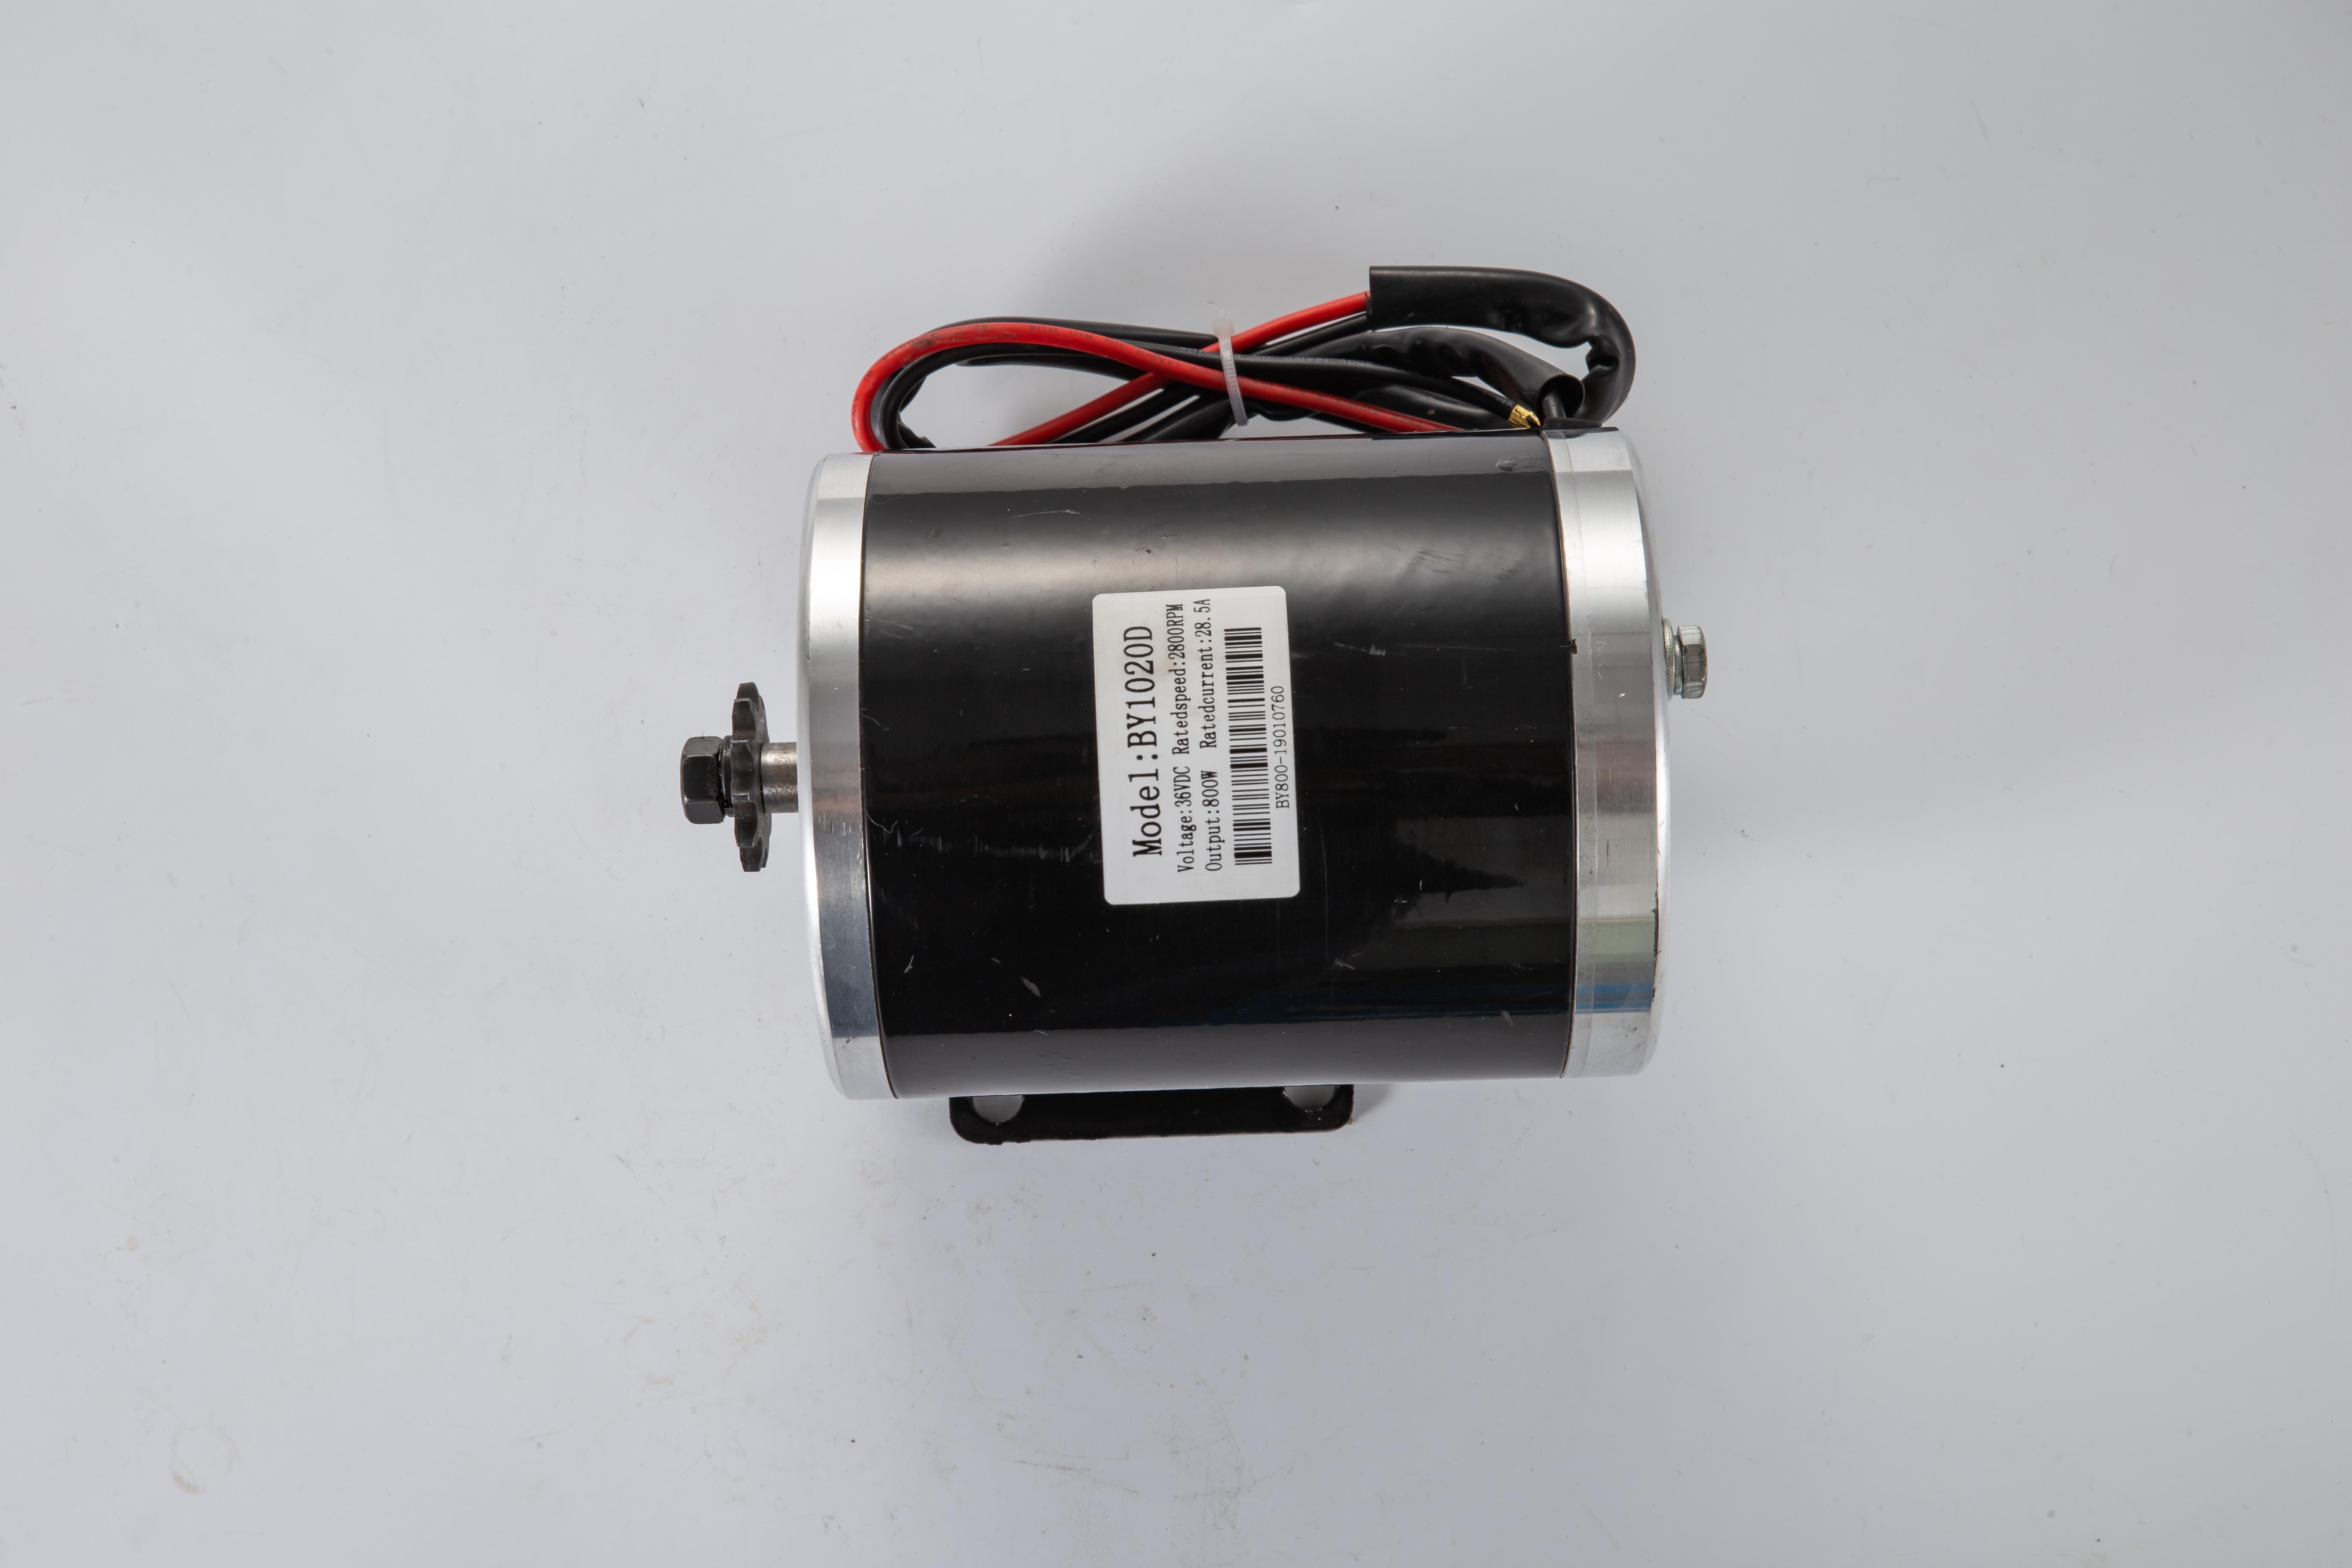 36v-Electric-Motor-controller-throttle-kit-f-Scooter-E-Scooter-ATV-Permanent thumbnail 167